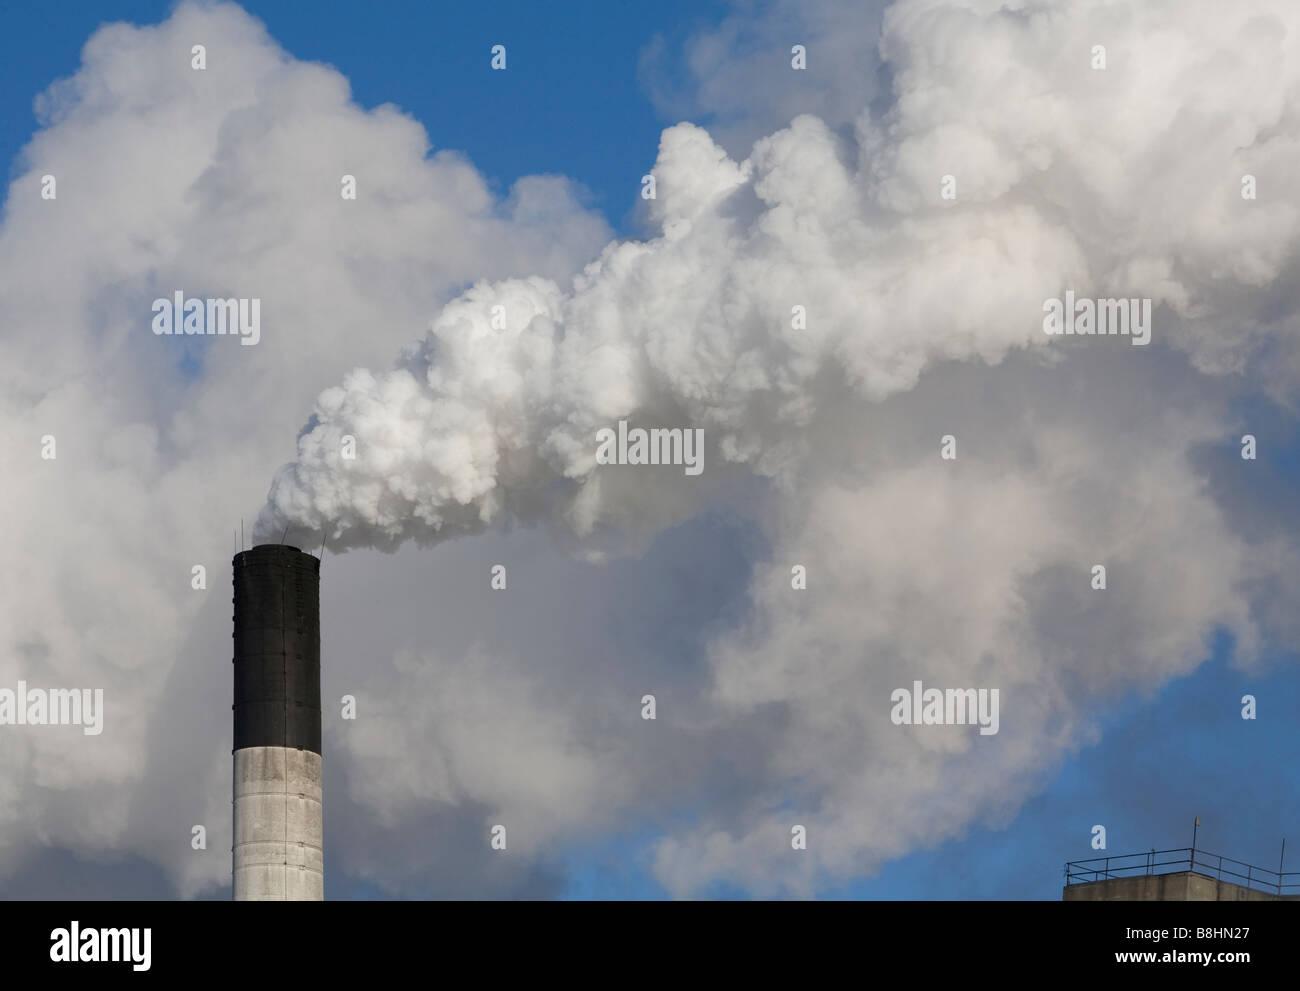 Croswell Michigan The smokestack of a sugar refinery operated by the Michigan Sugar Company - Stock Image